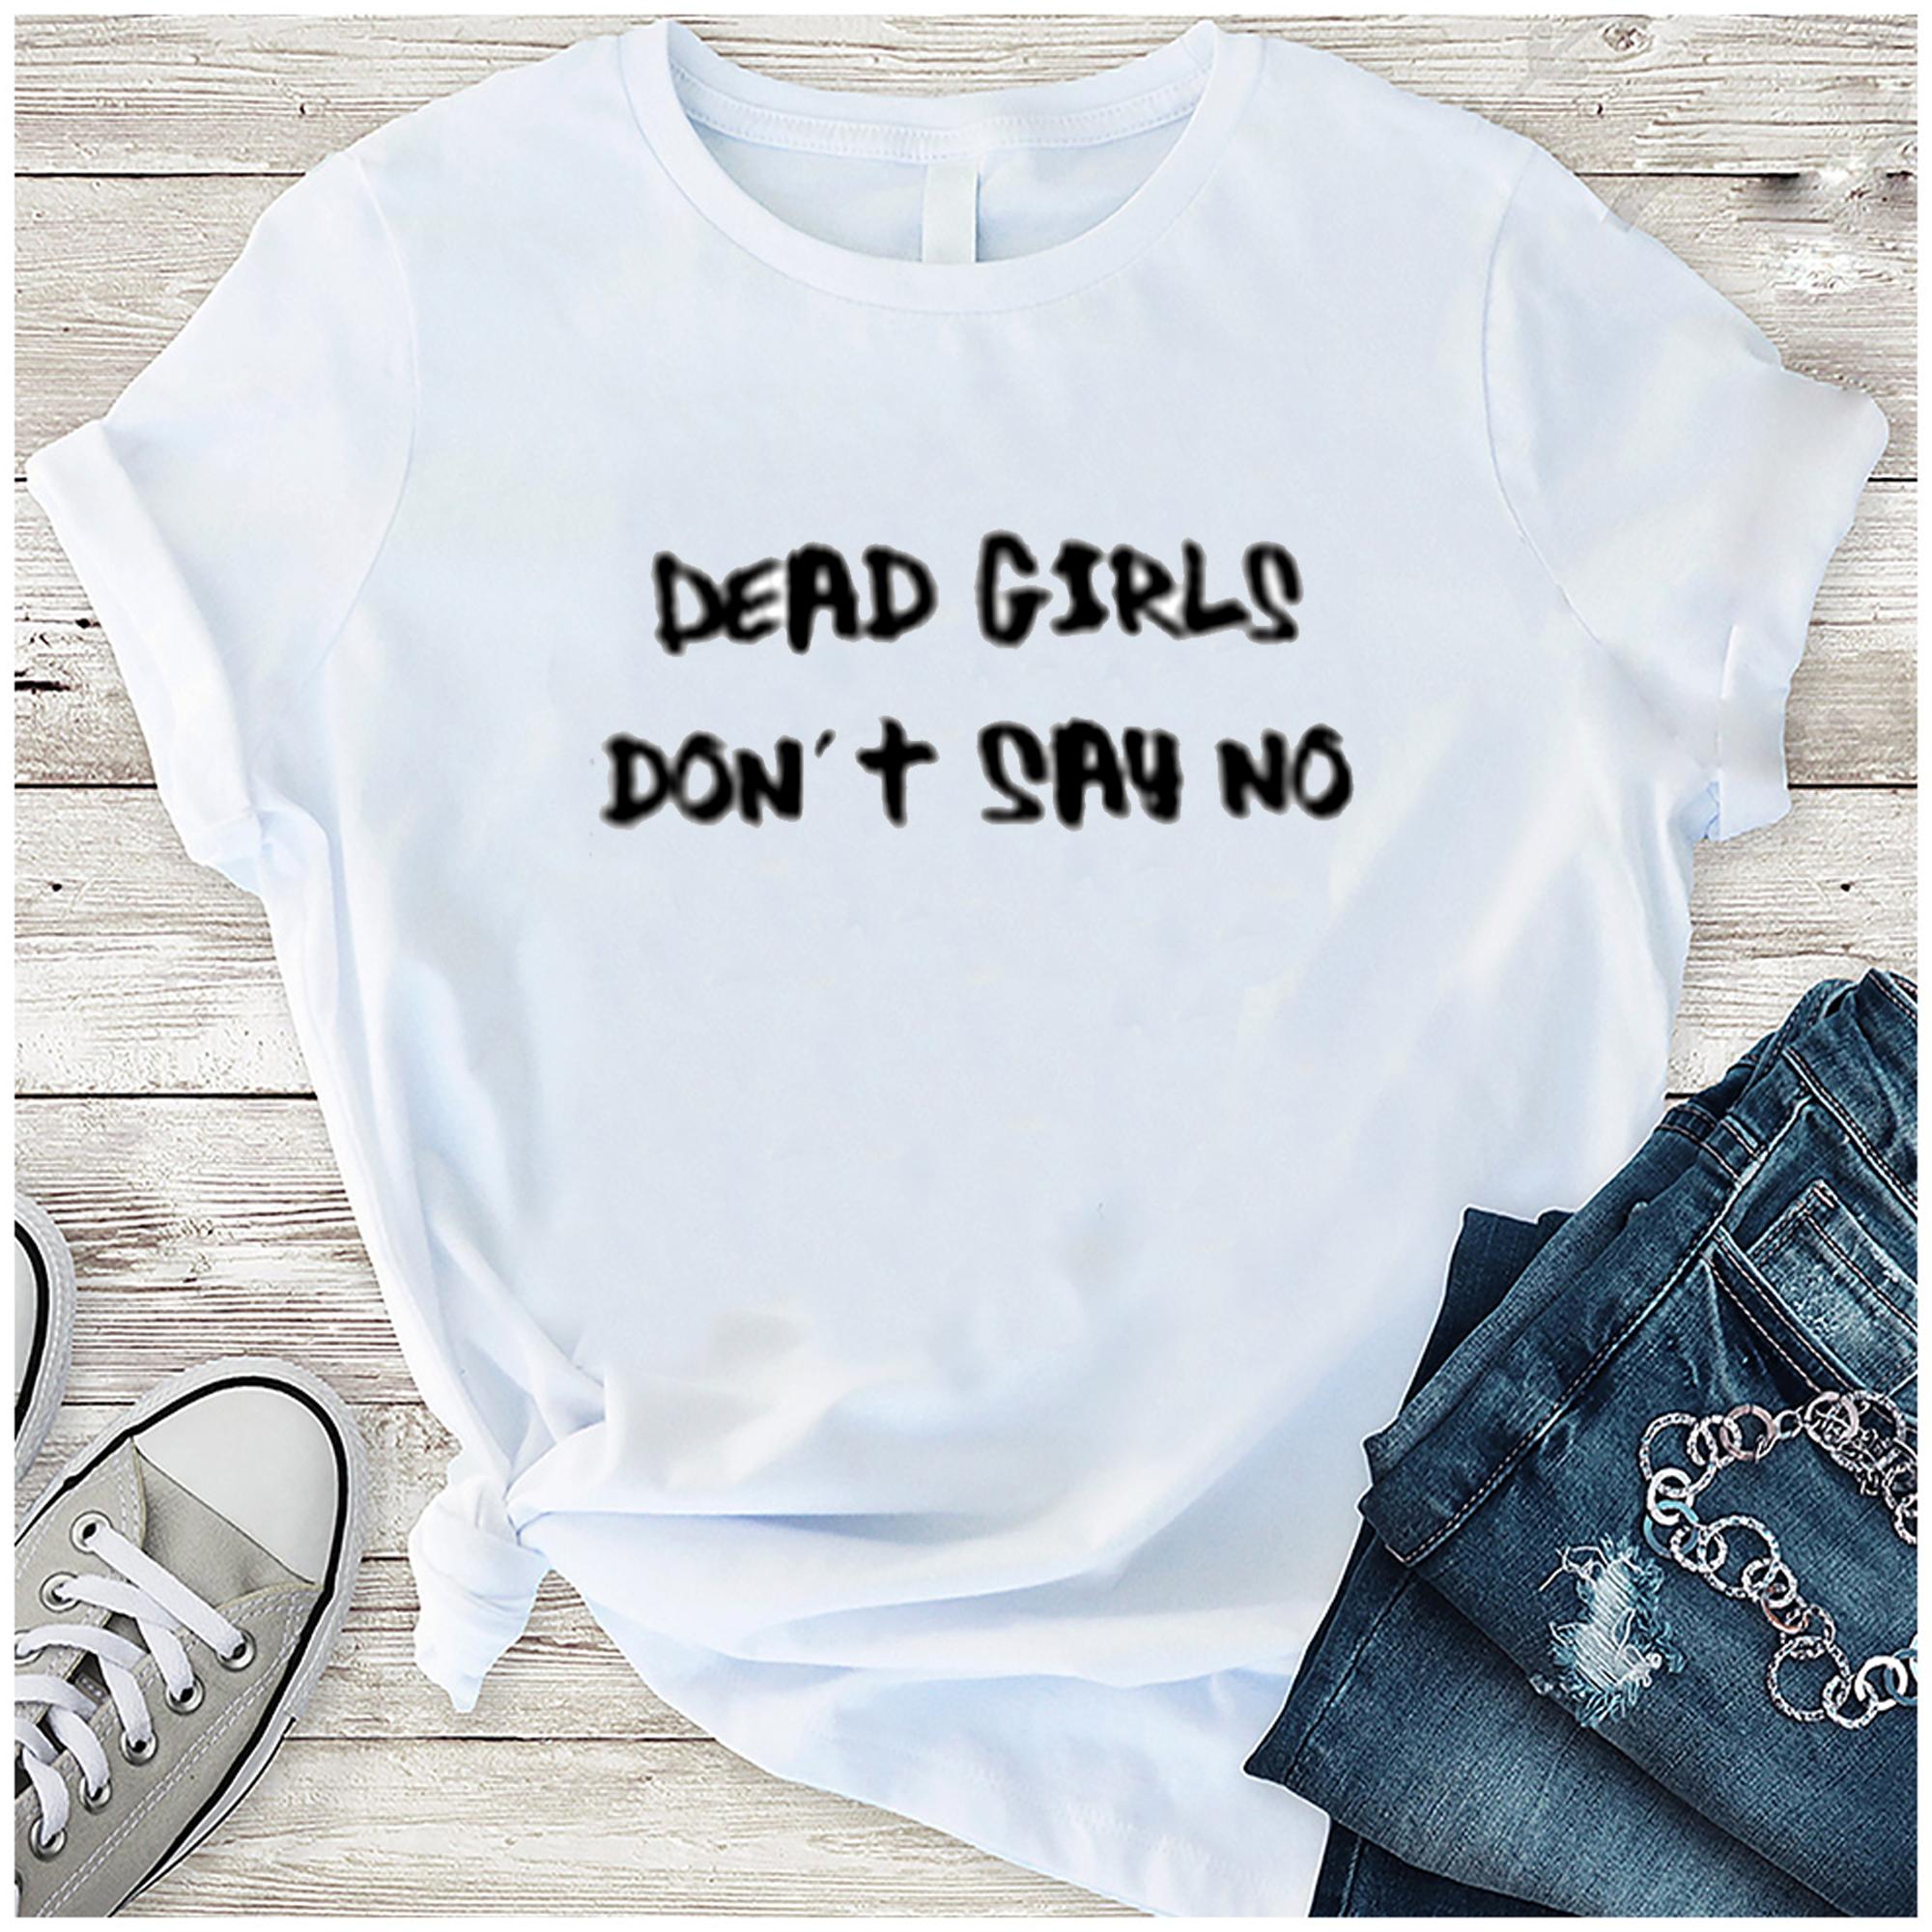 Obscene Lover Shirt Dead Girls Don't Say No